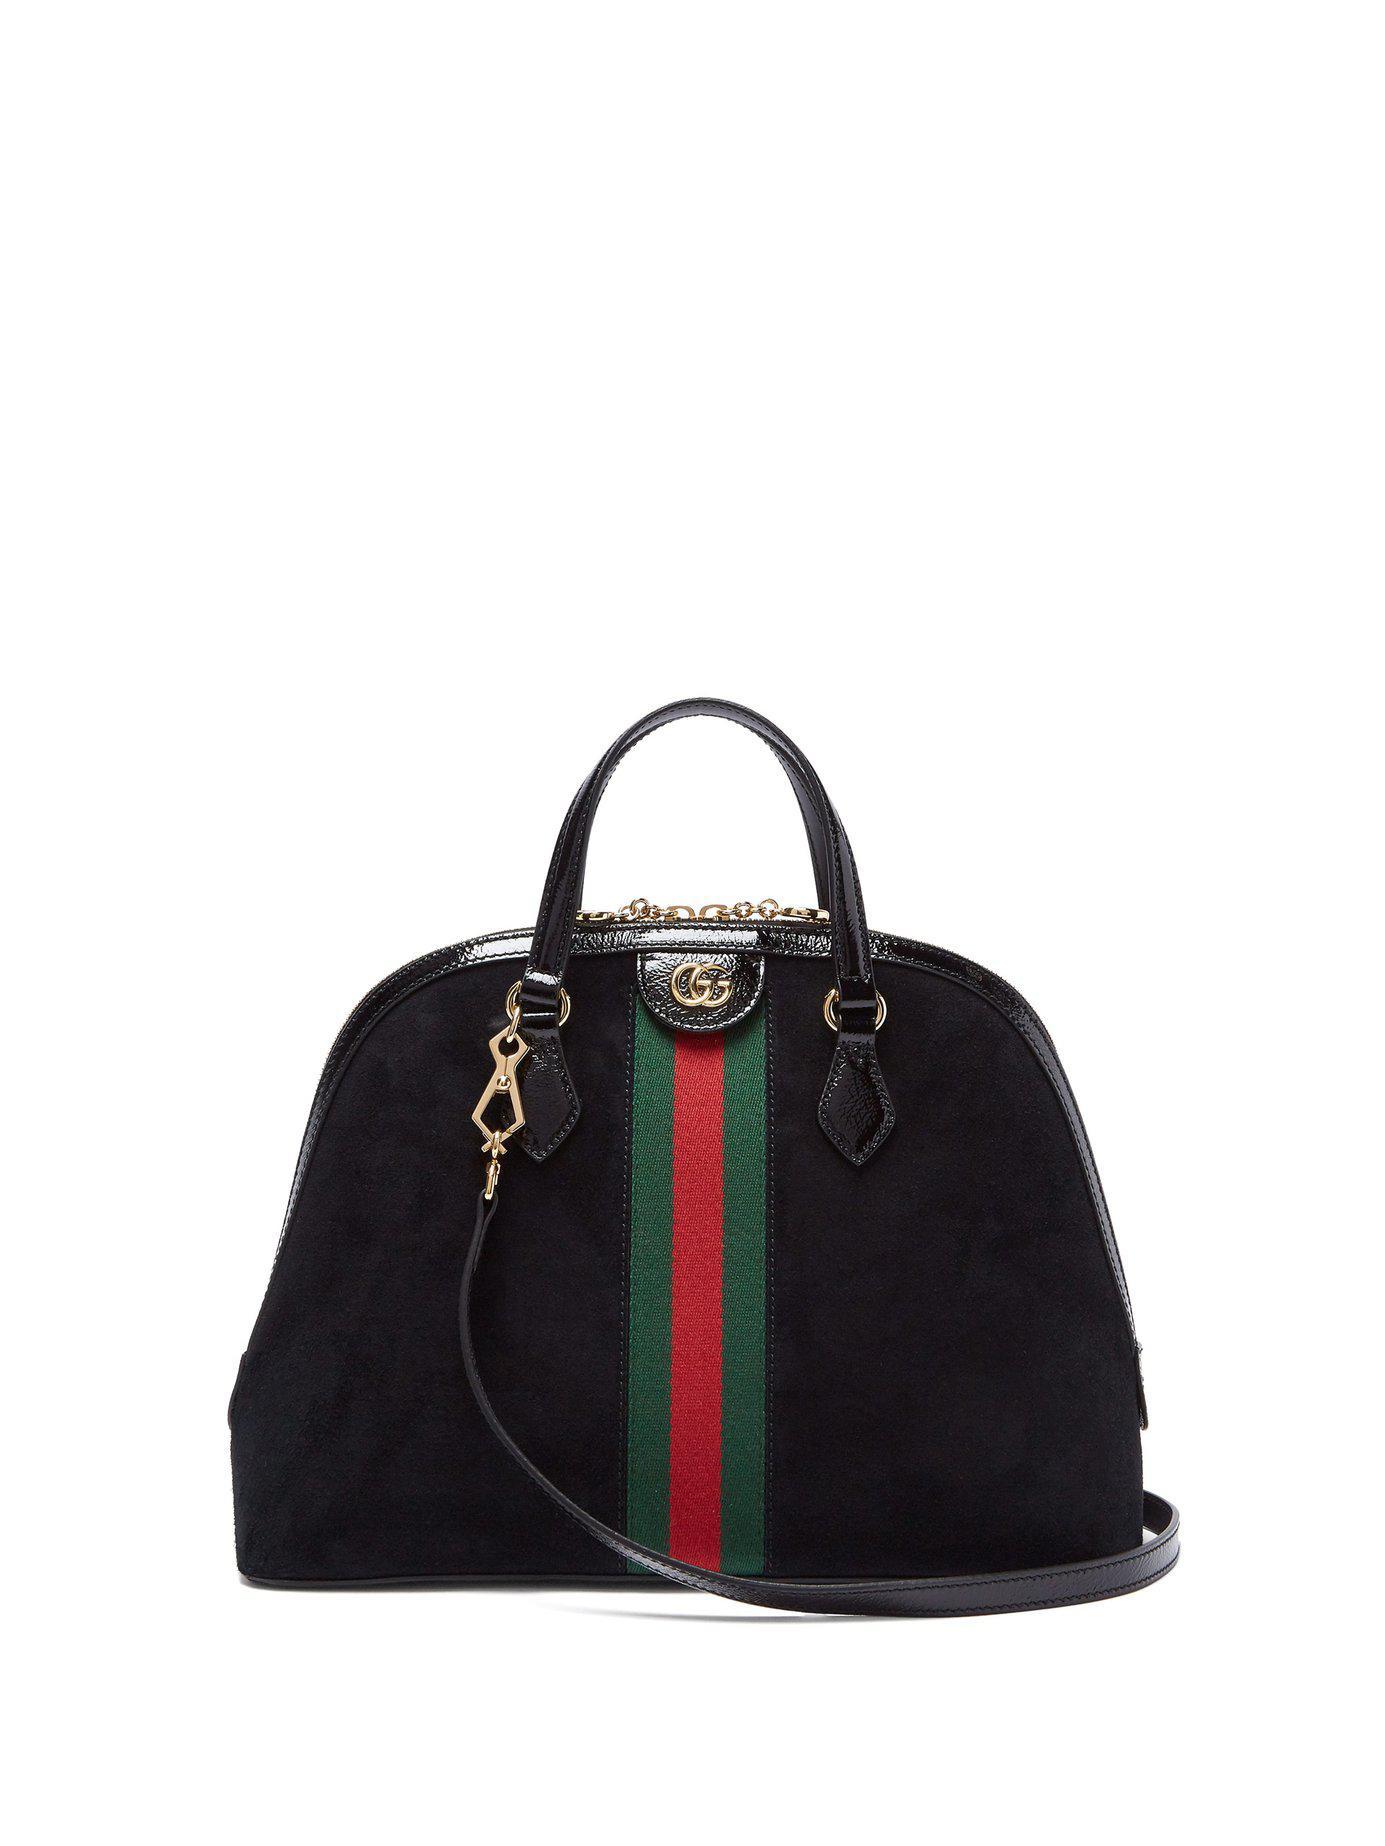 340c49fdc016 Gucci Suede Bag – Hanna Oaks